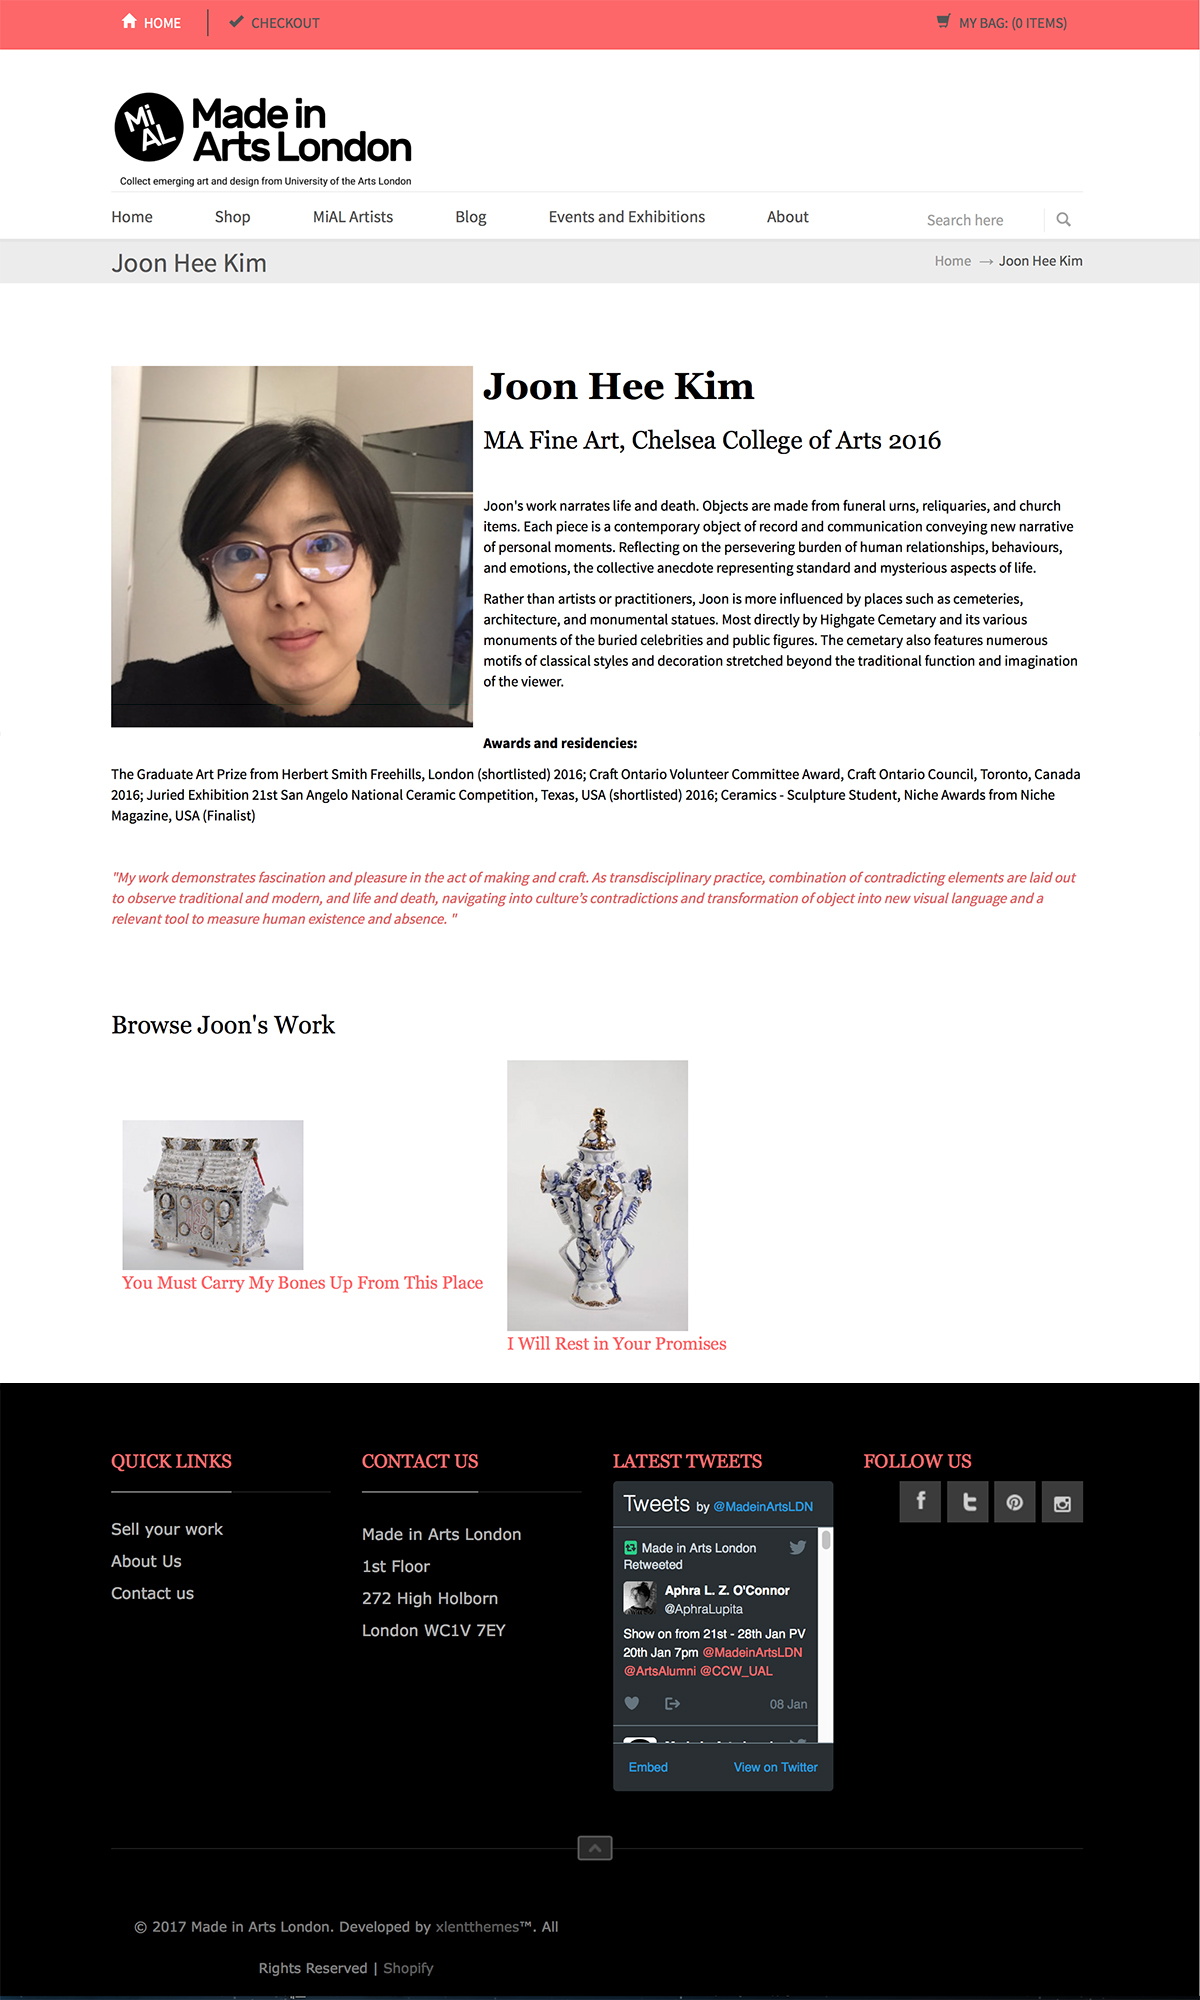 Joon Hee Kim MA Fine Art, Chelsea College of Arts 2016  https://www.madeinartslondon.com/pages/joon-hee-kim